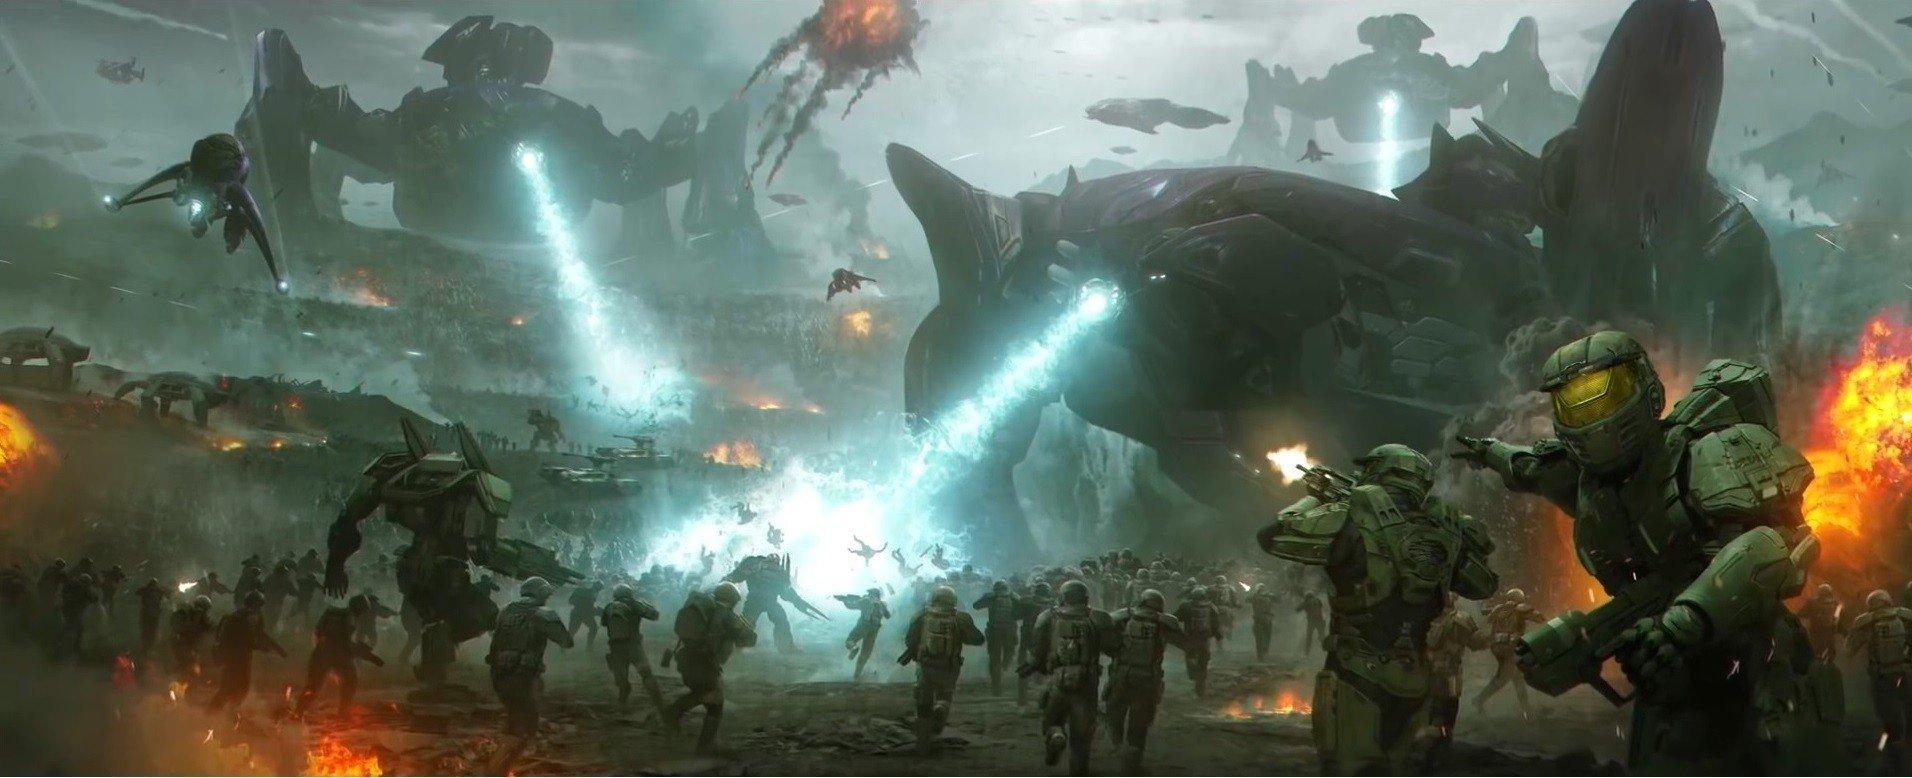 Wallpaper 1912x778 Px Halo Halo Wars 2 Spartans